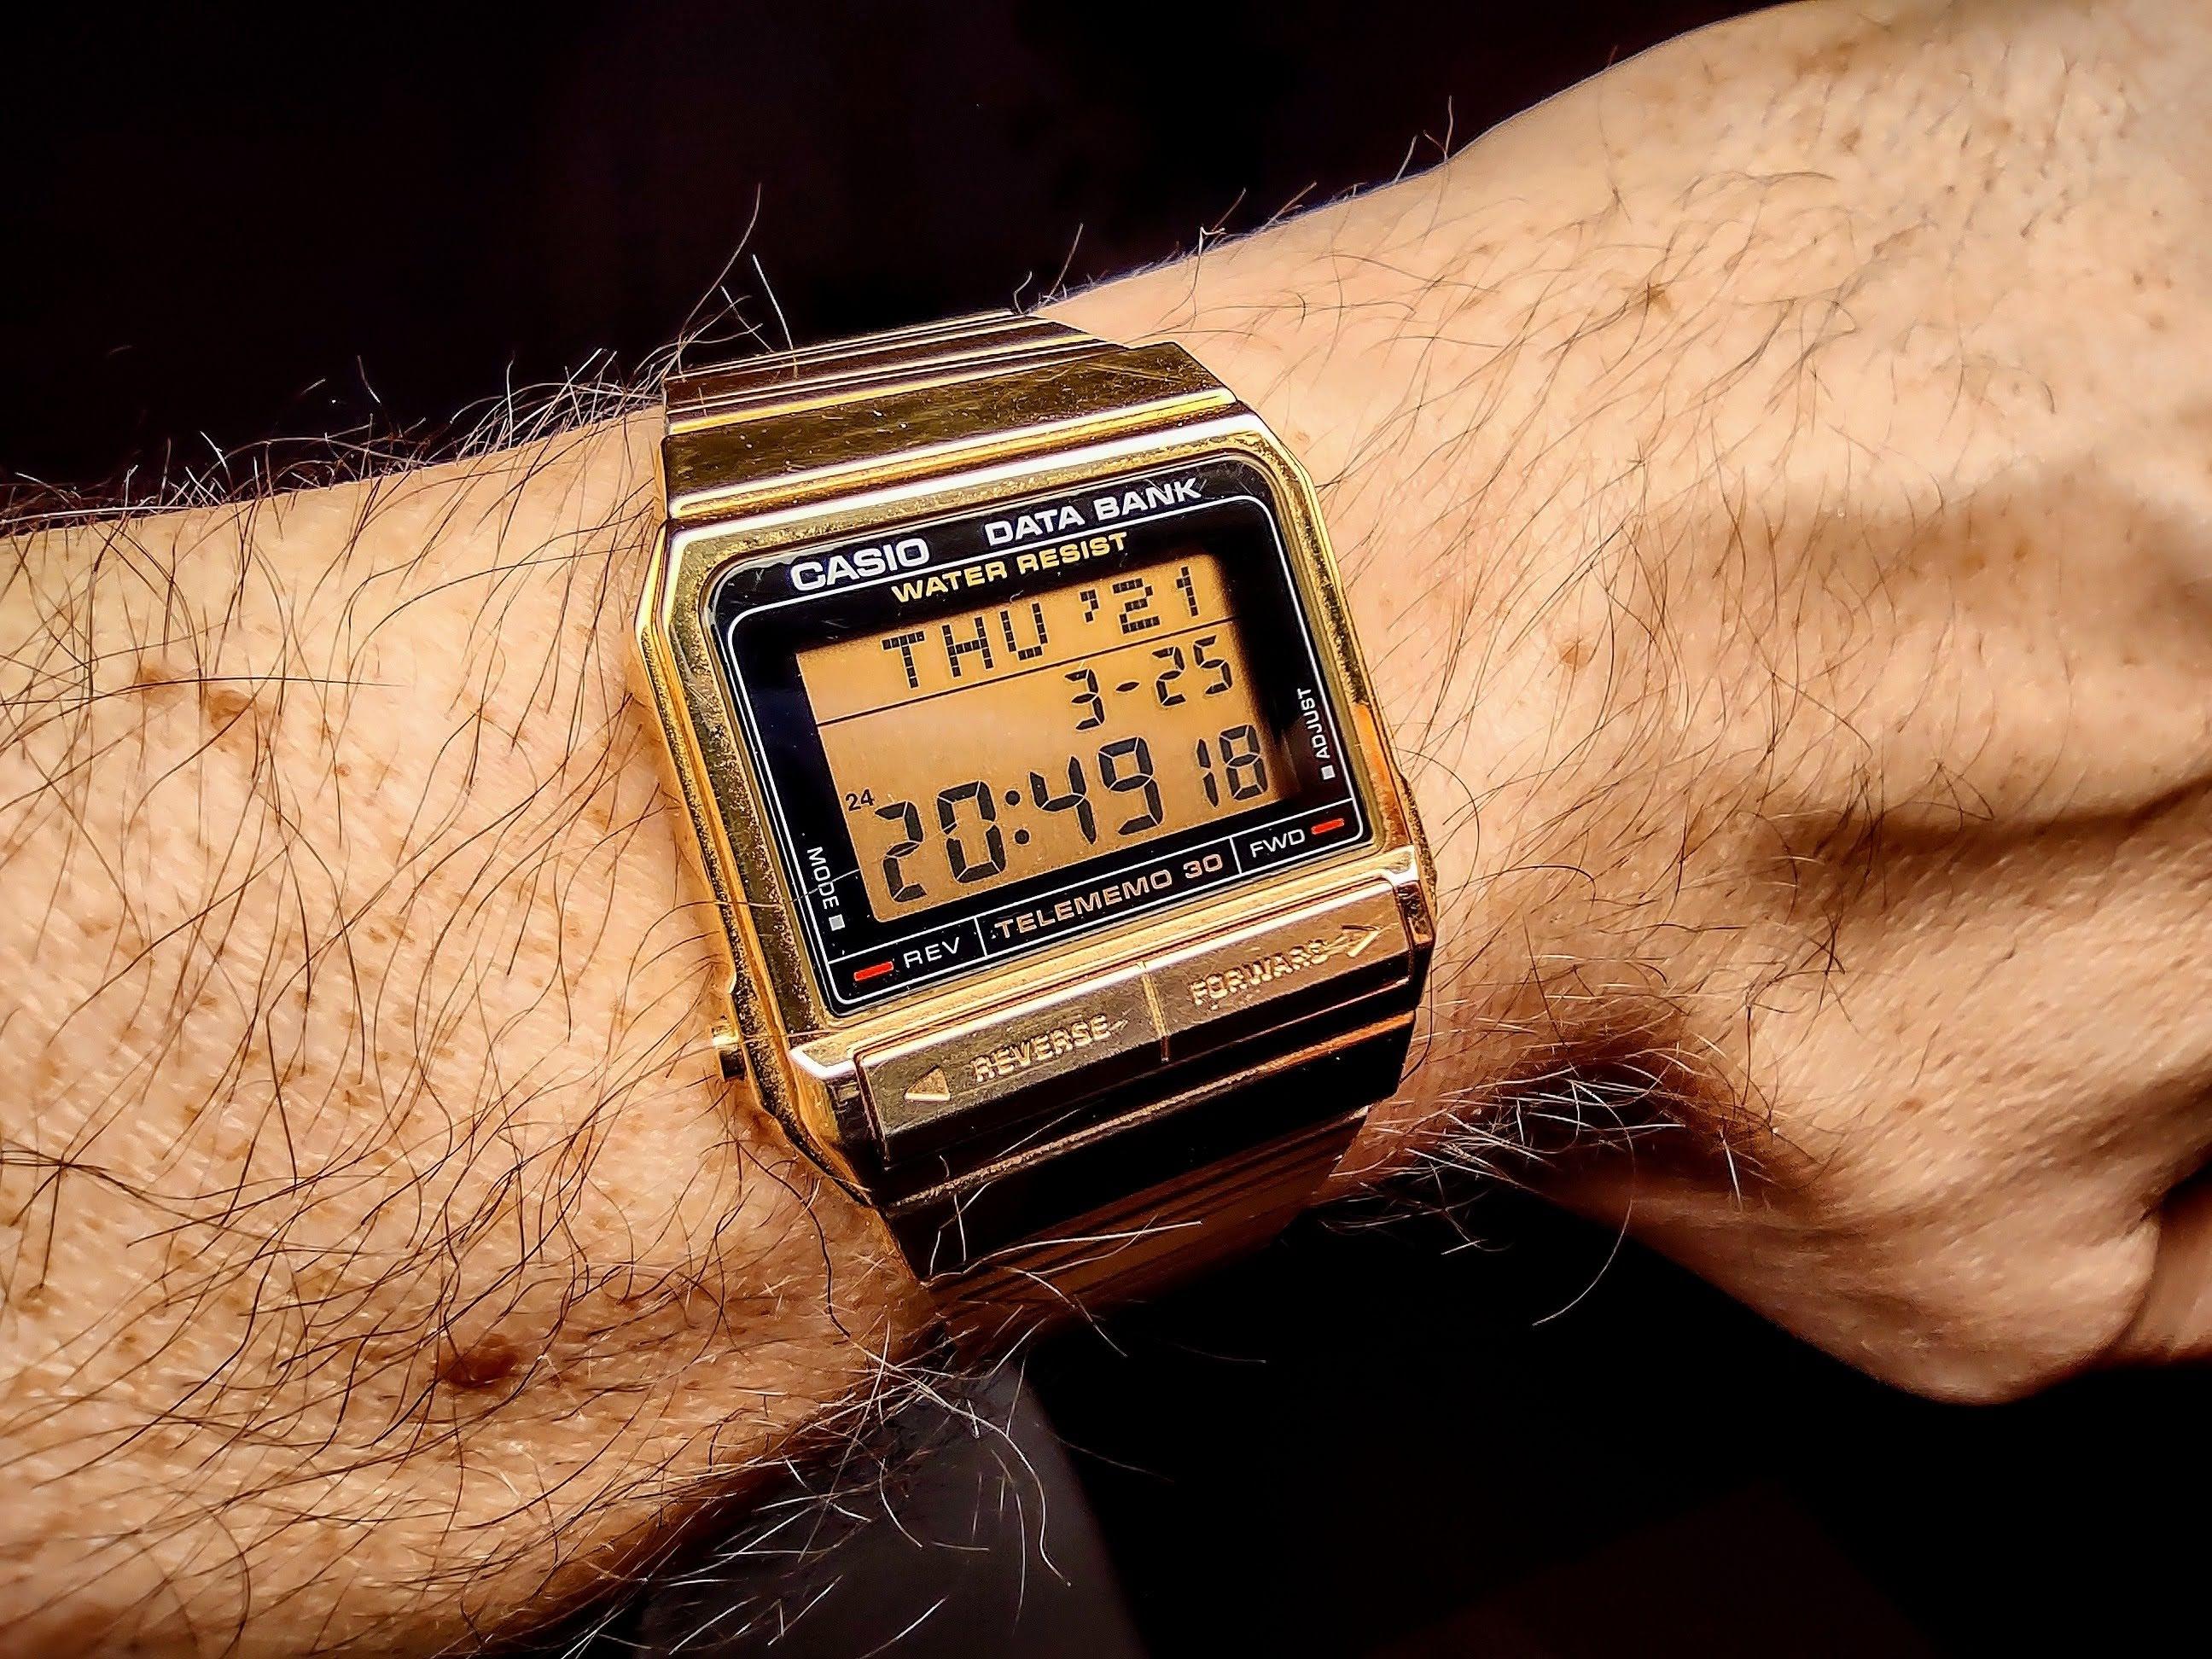 Gold Casio Data Bank Watch 1985 Japan